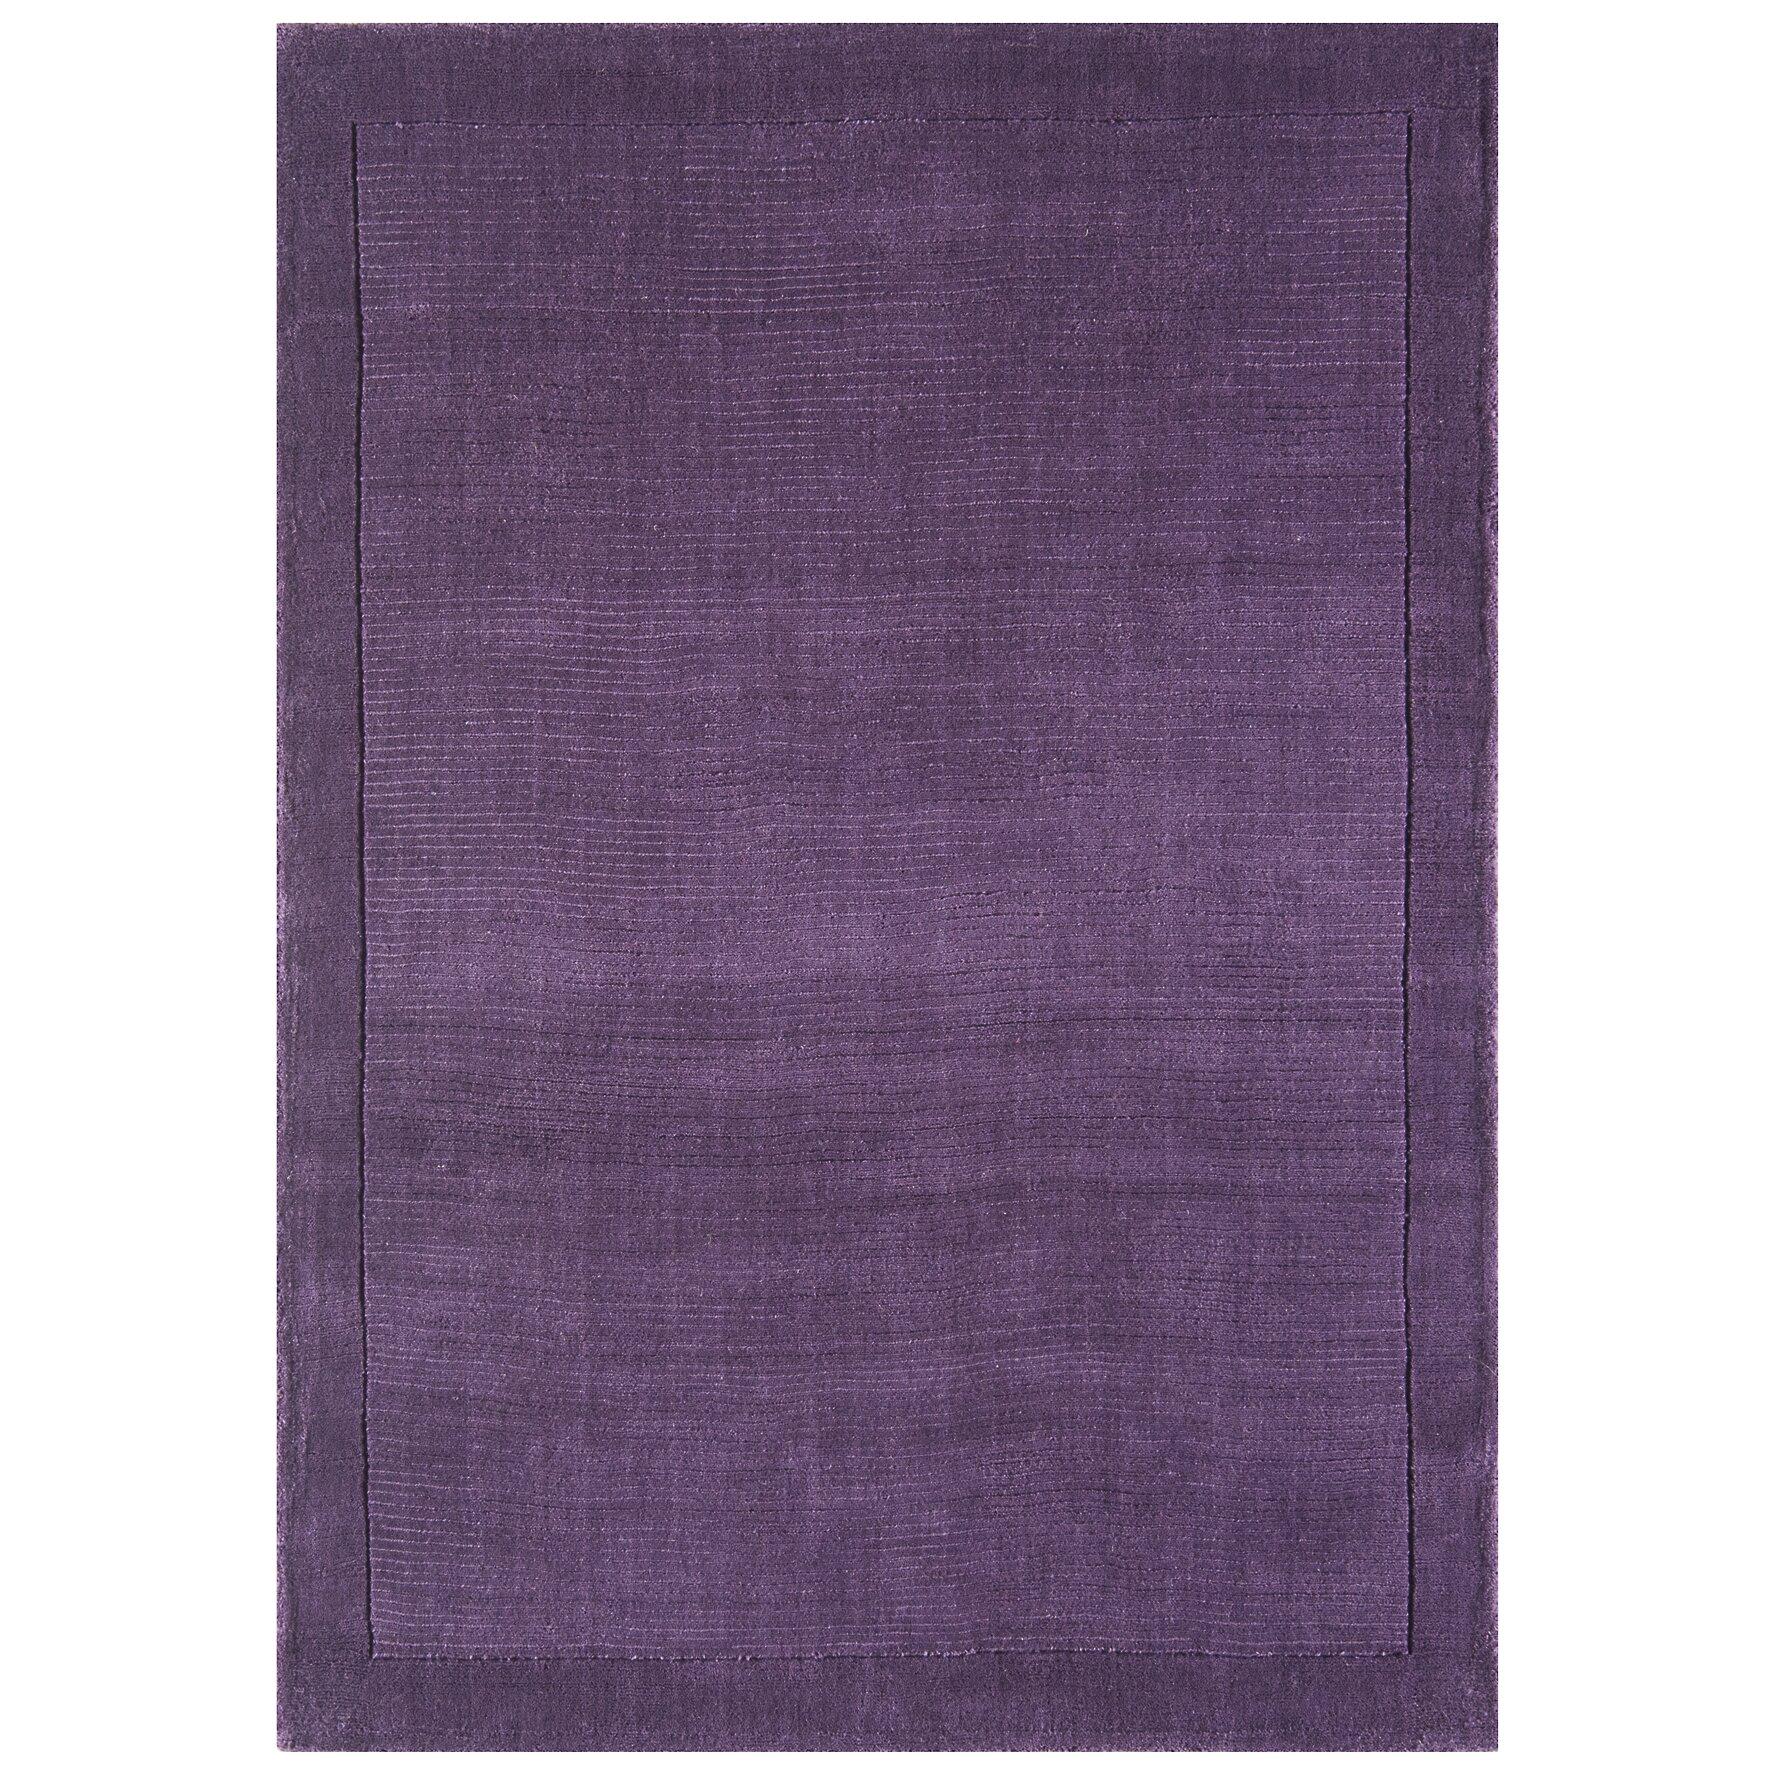 ... carpet s in york pa axiomatica org leppo carpet cleaners inc ...